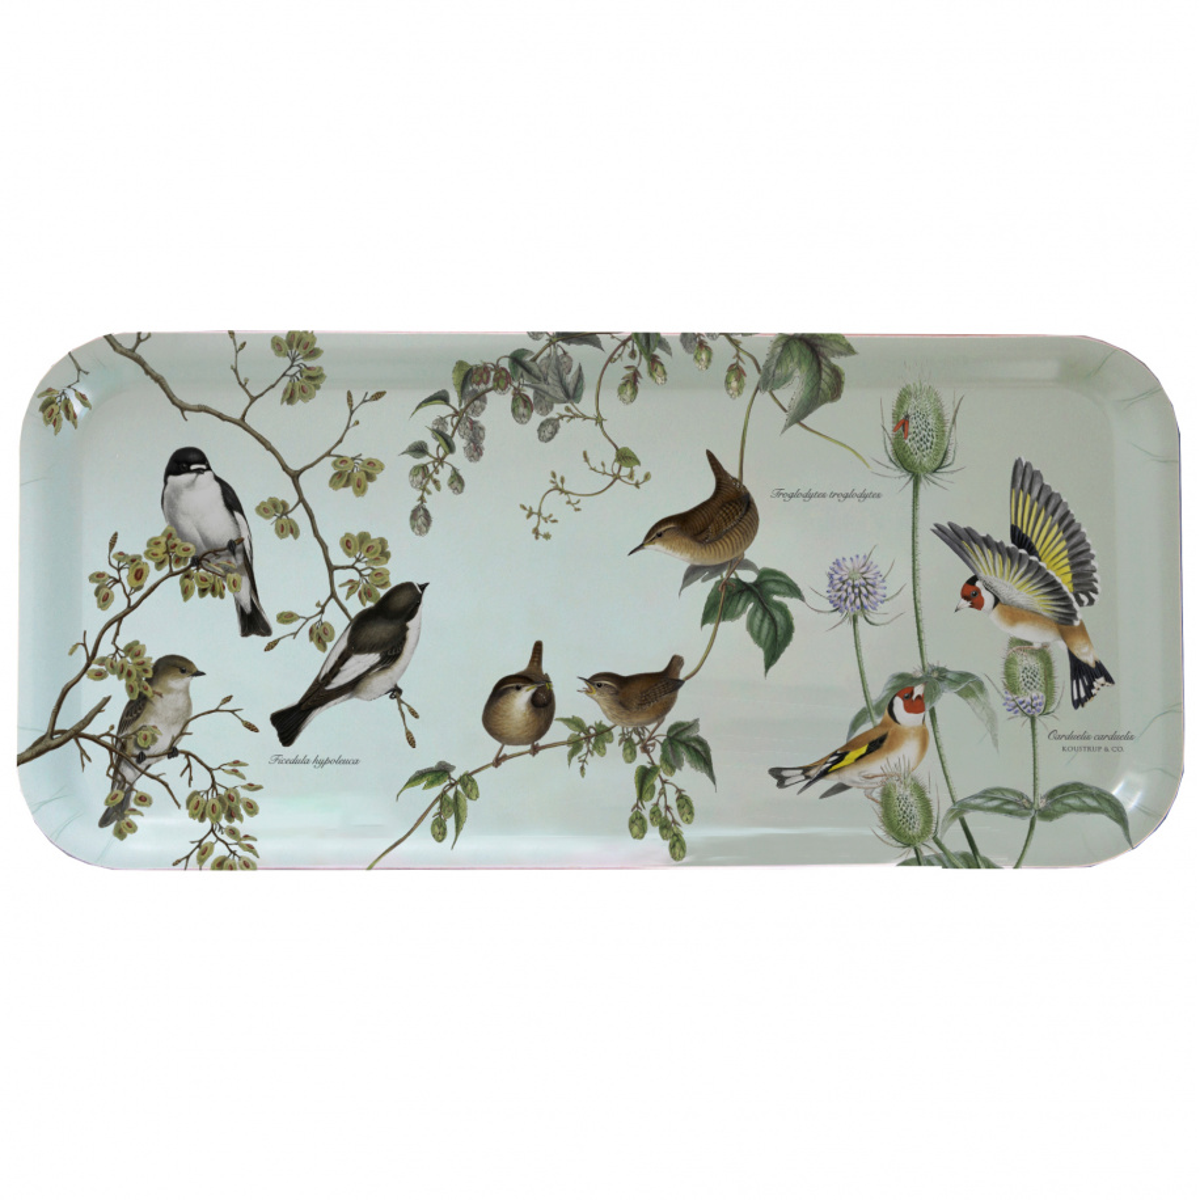 Koustrup & Co. bakke - havens fugle